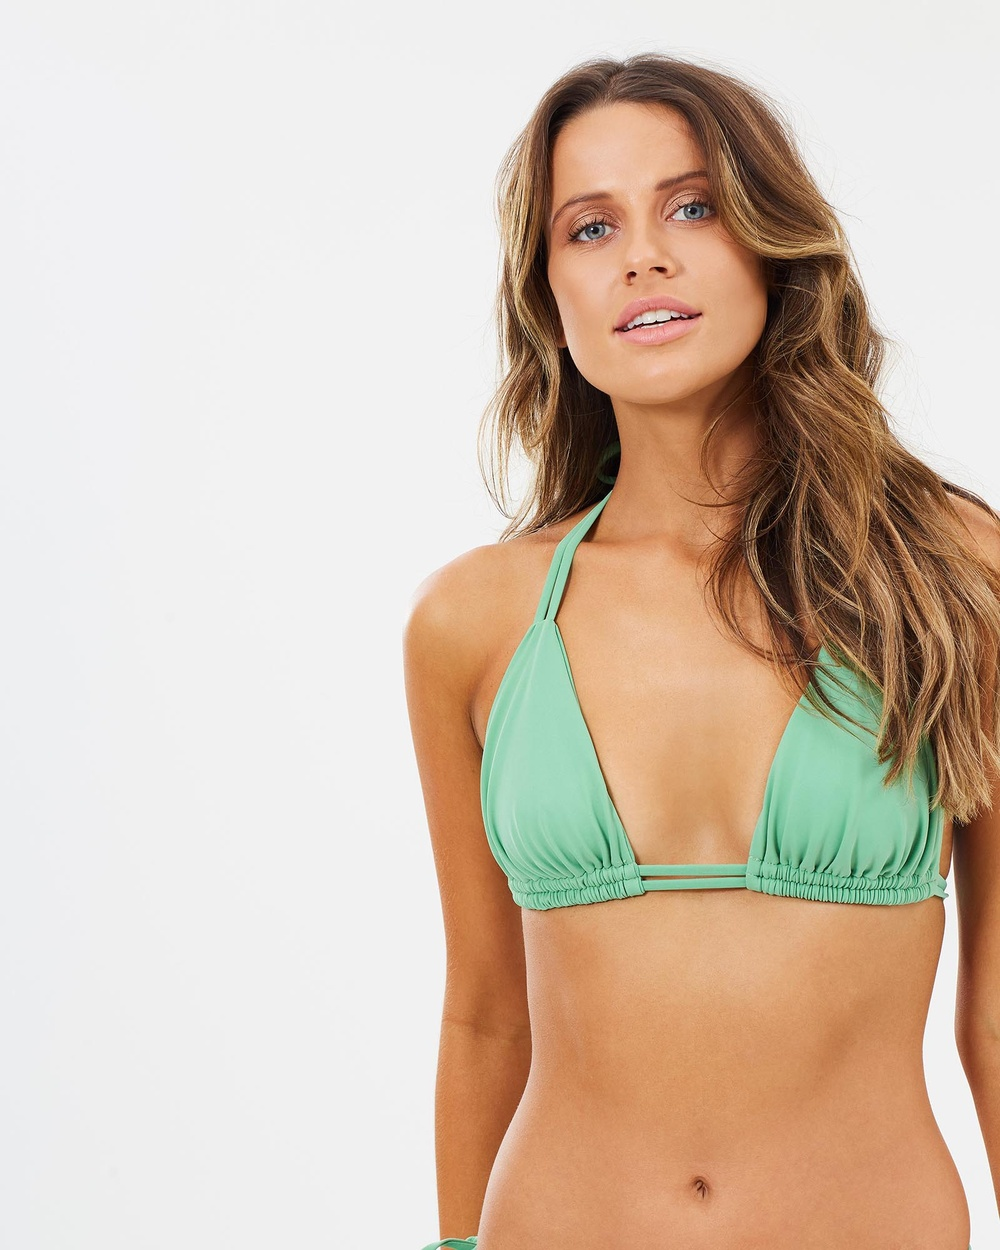 Tanliines The Radical Top Bikini Tops Mint The Radical Top